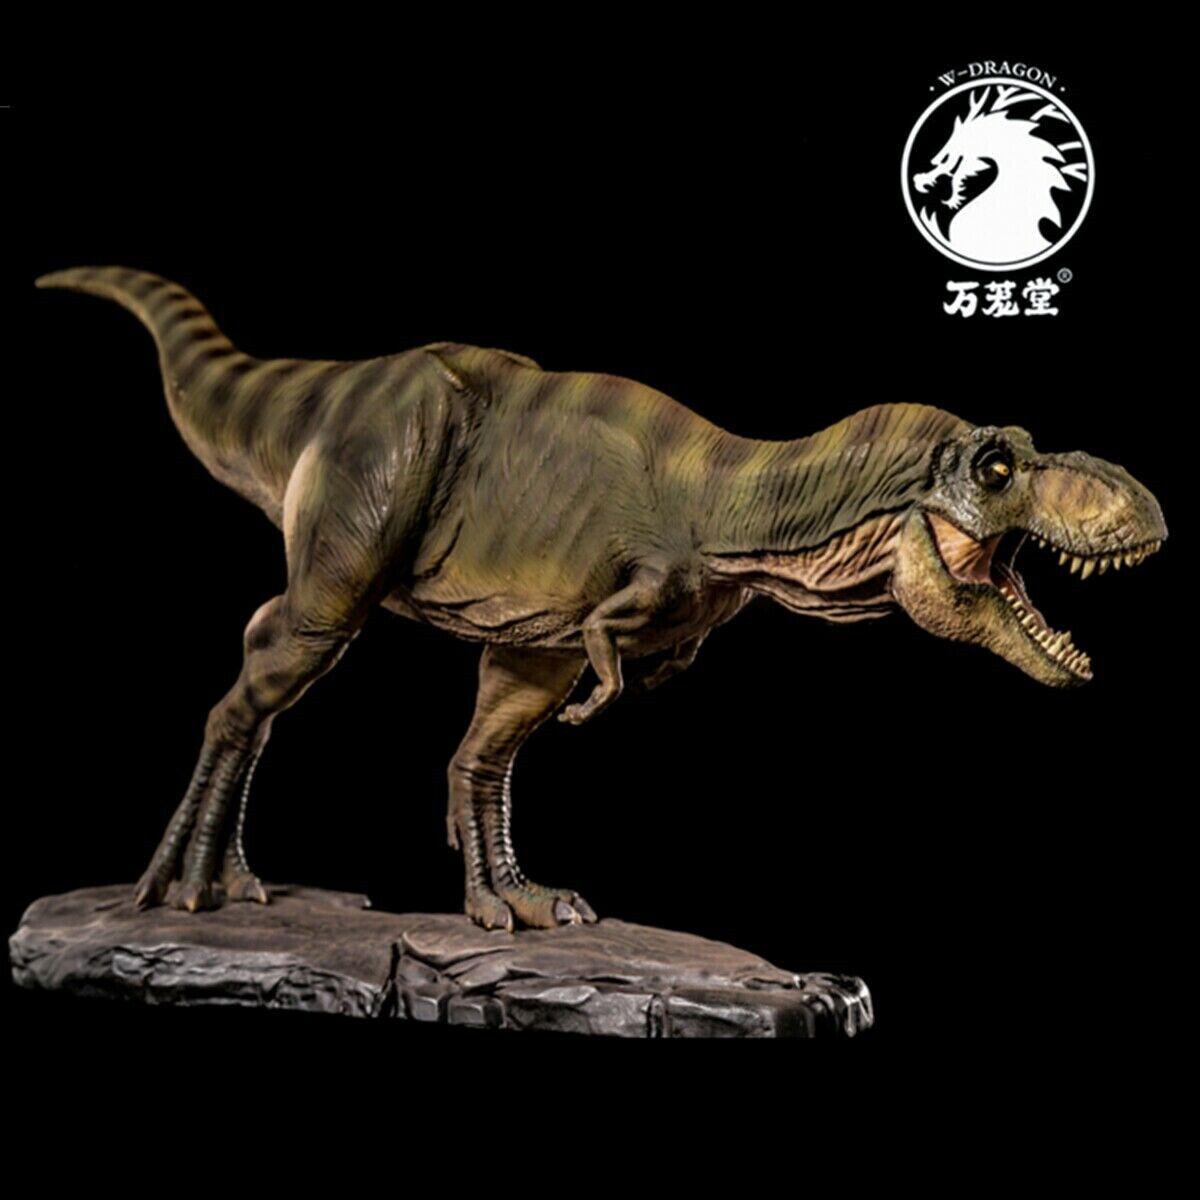 W-Dragon Tyrannosaurus Rex Model T-Rex Statue Dinosaur Figure Collector Toy @@@